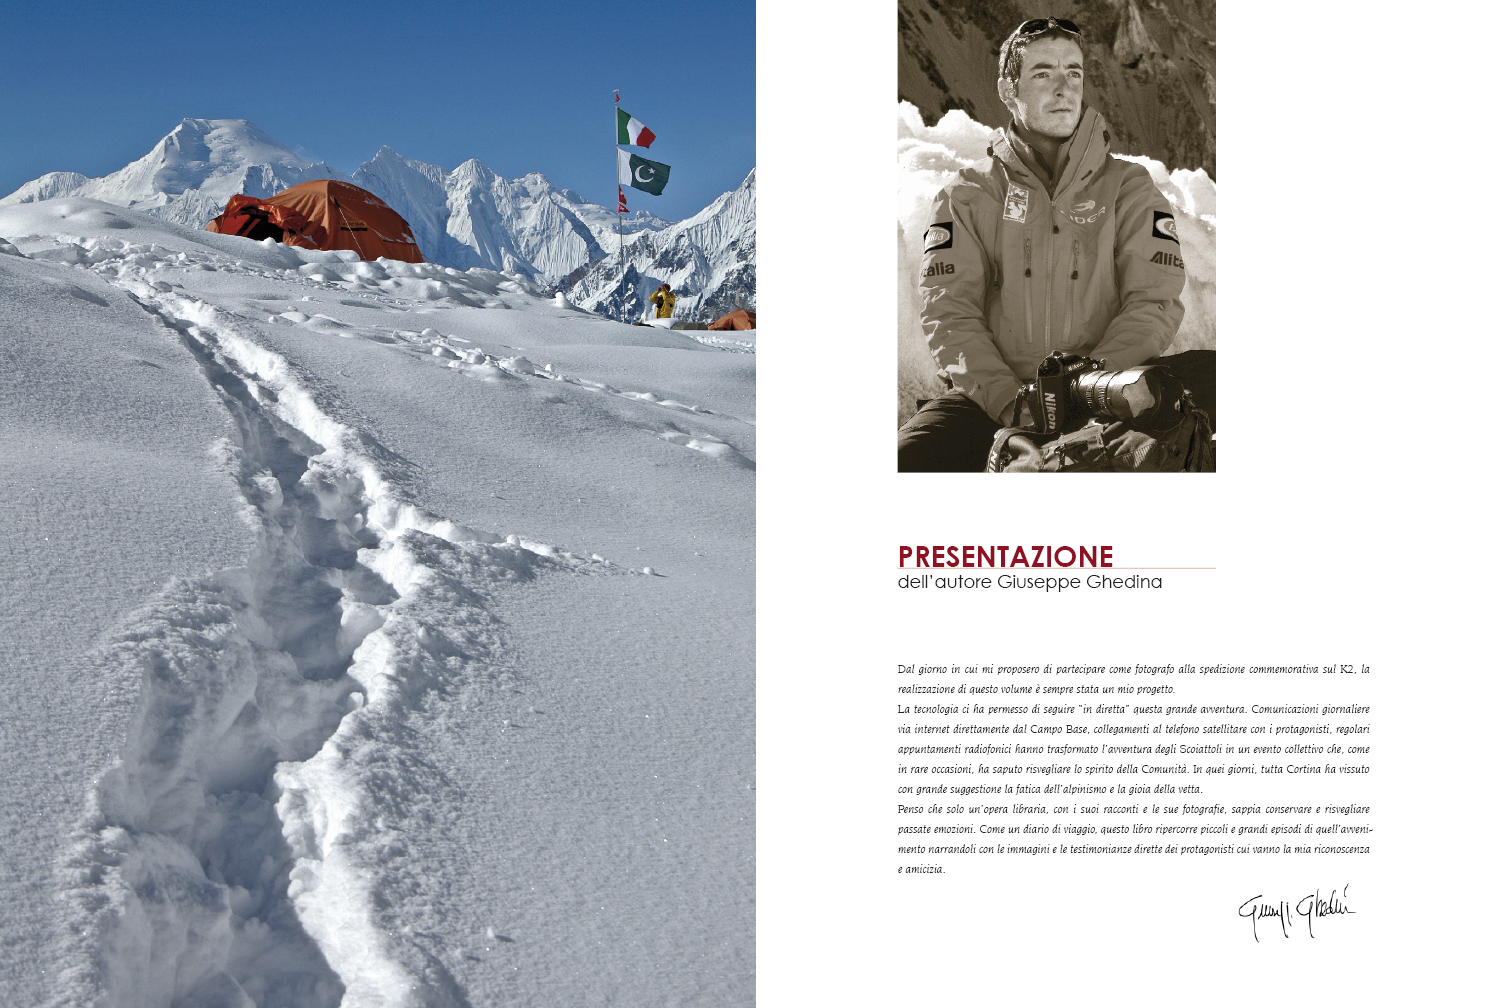 K2 EXPEDITION 1954-2004 Giuseppe Ghedina Fotografo - 004.jpg